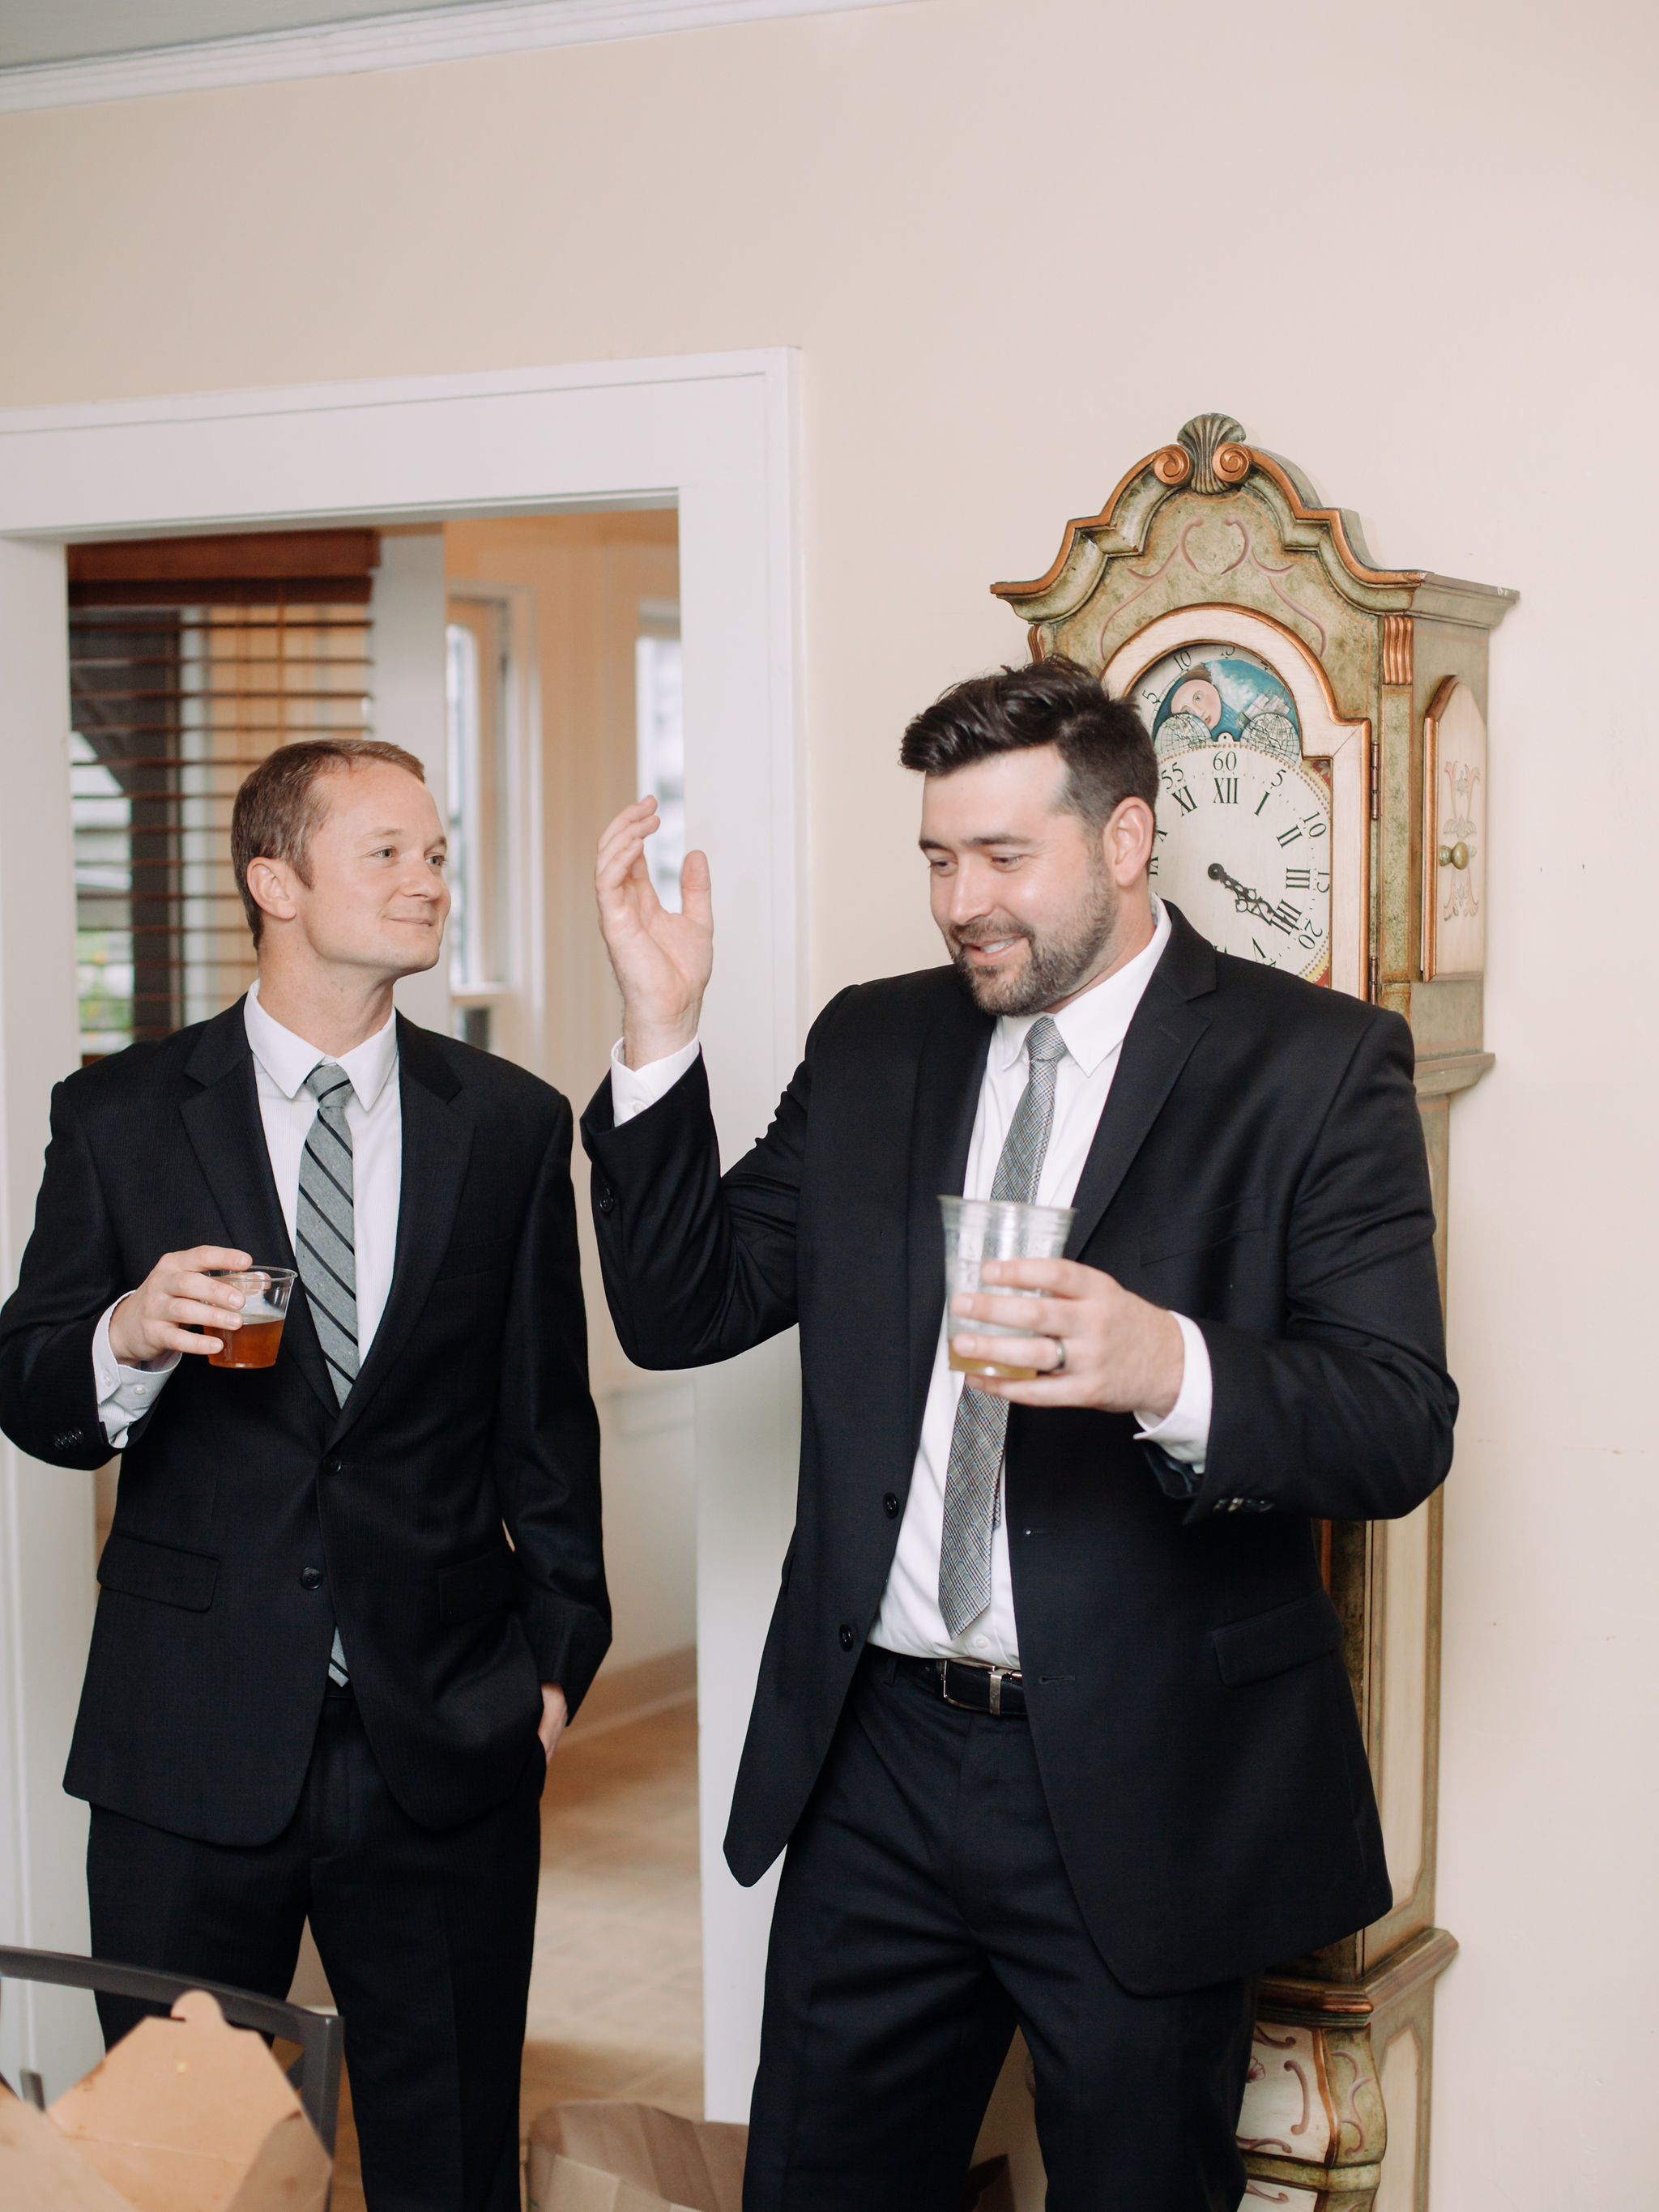 julie-and-adam-wedding-getting-ready-details-19.jpg